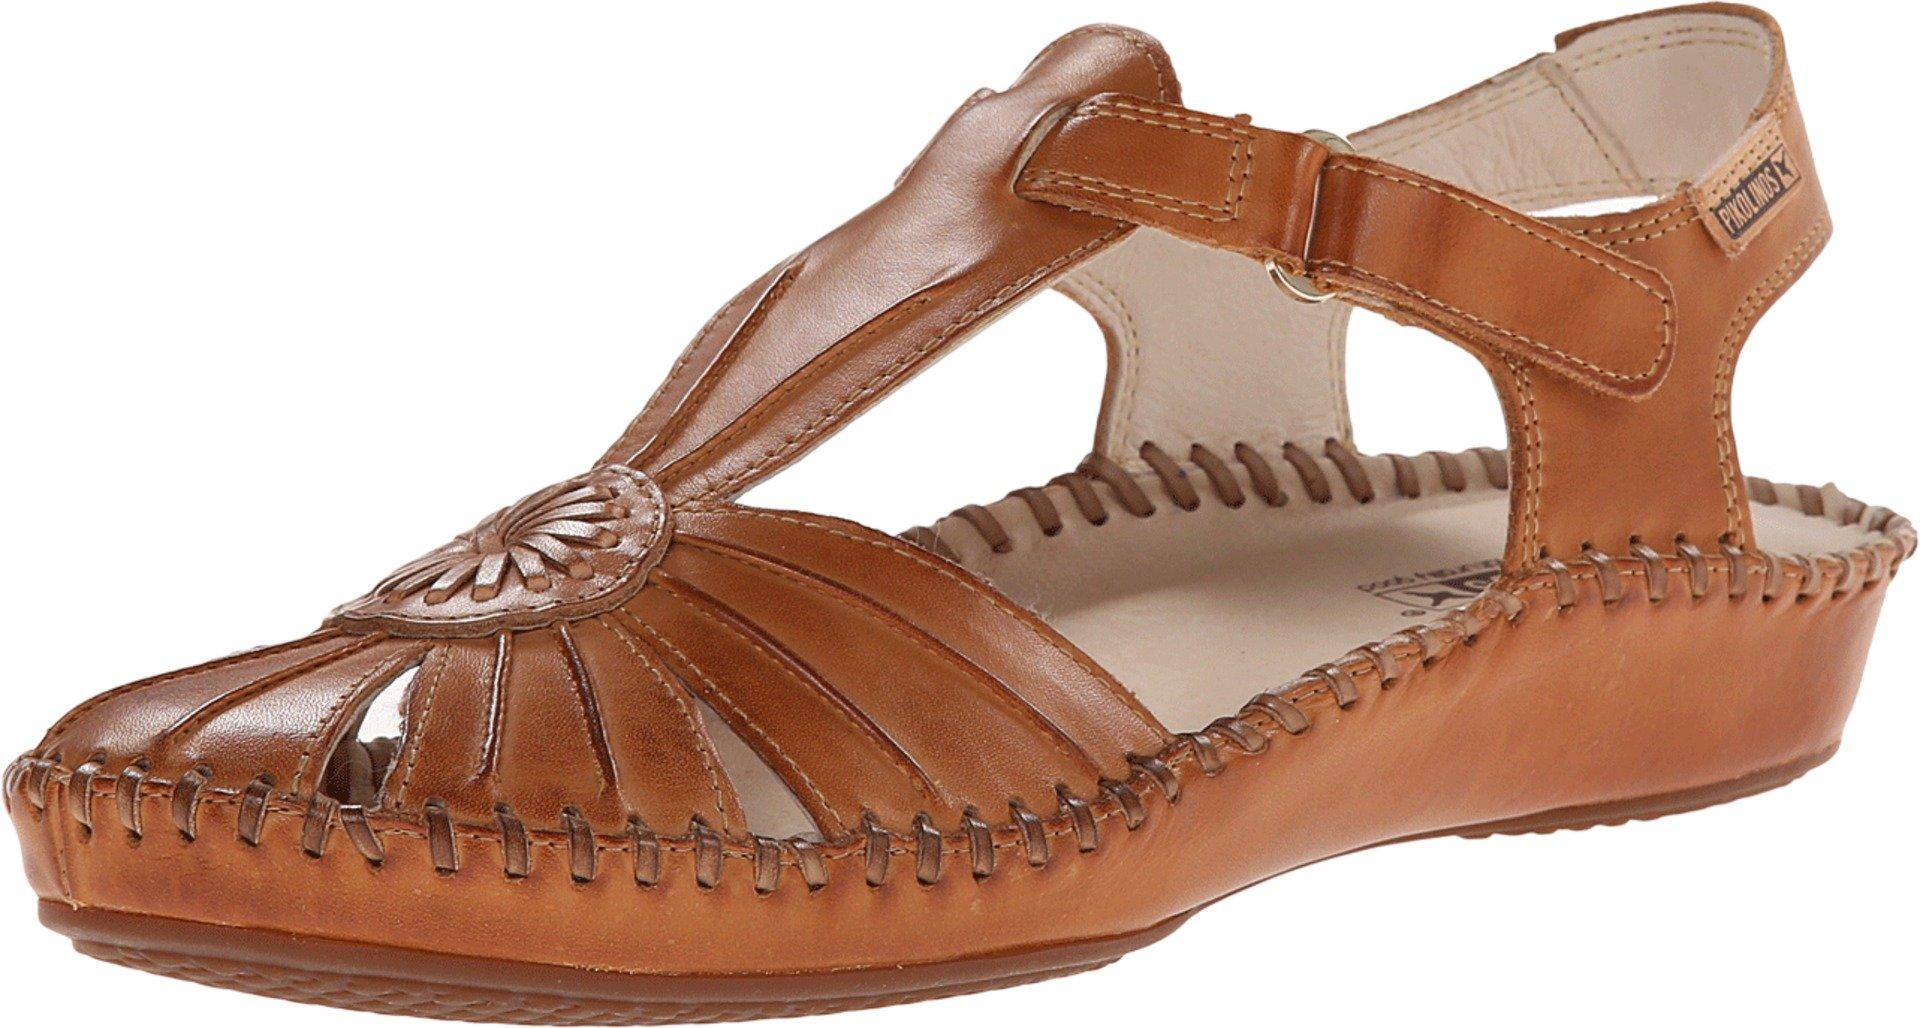 Pikolinos Women's VALLAR Brown Sandal 38 M EU, 7.5-8 M